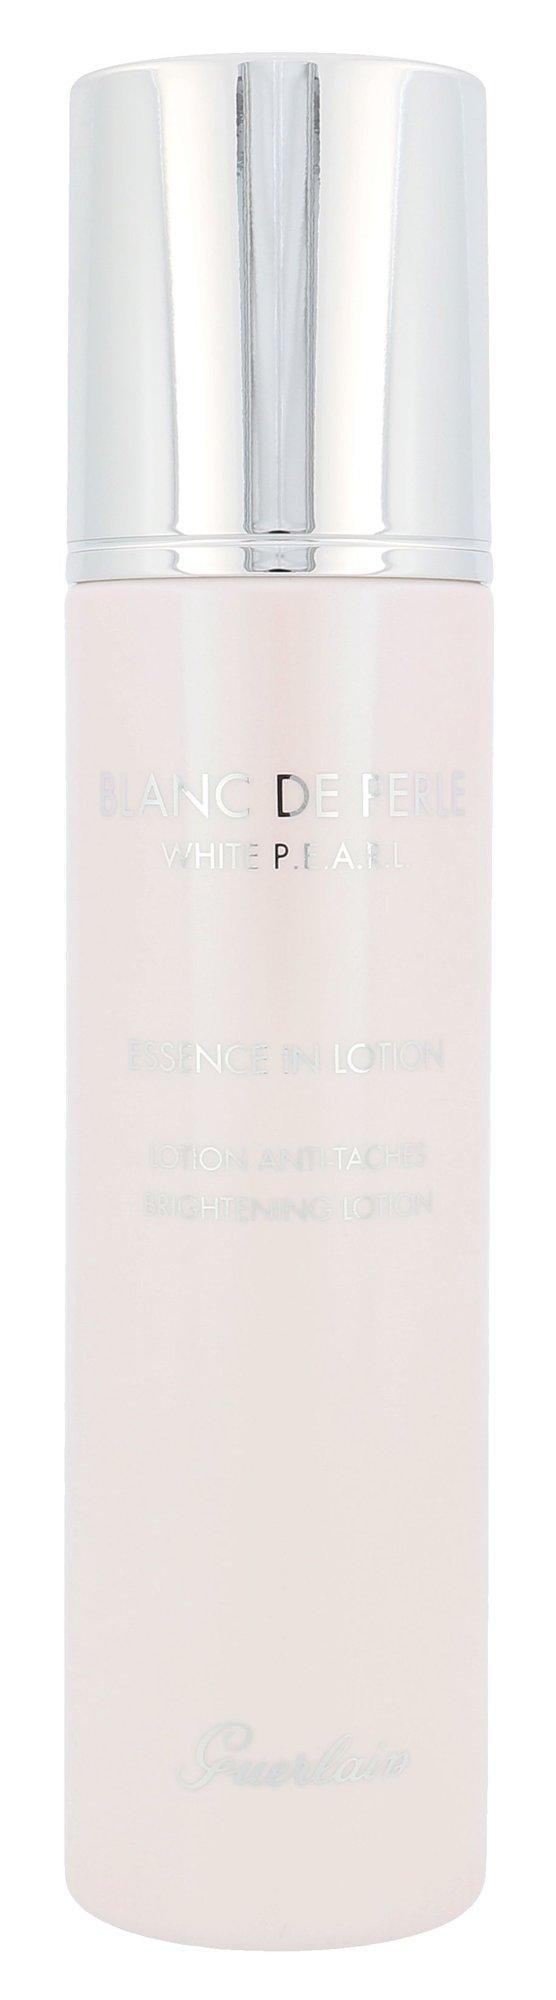 Guerlain Blanc De Perle Cosmetic 200ml